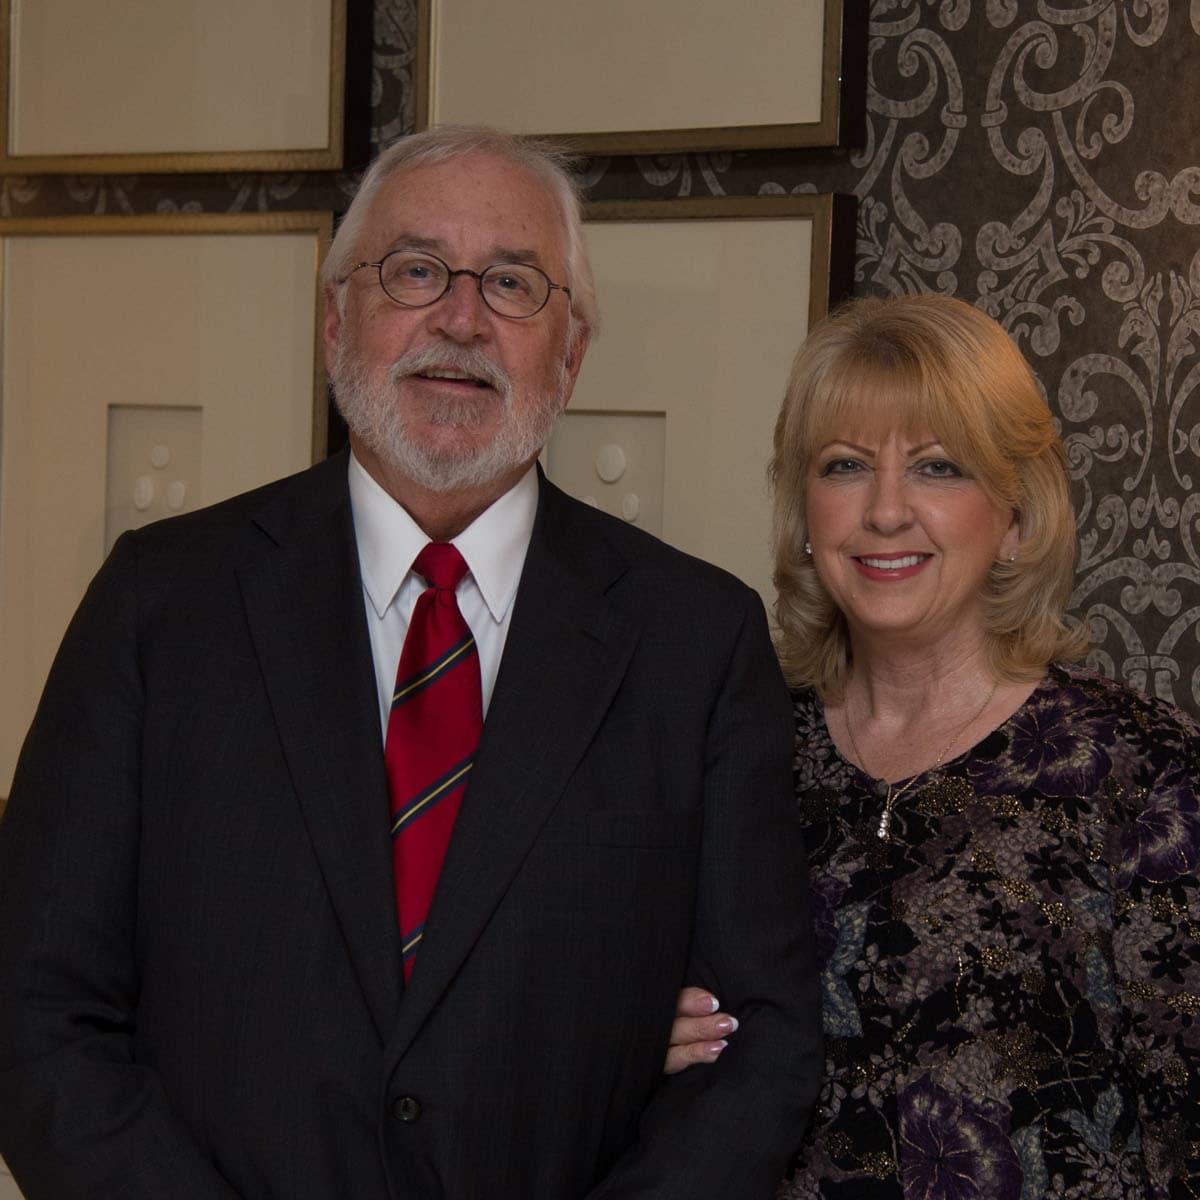 News, Shelby, Houston Bar Harvest Party, Nov. 2015,Stewart Gagnon, Lynn Gagnon